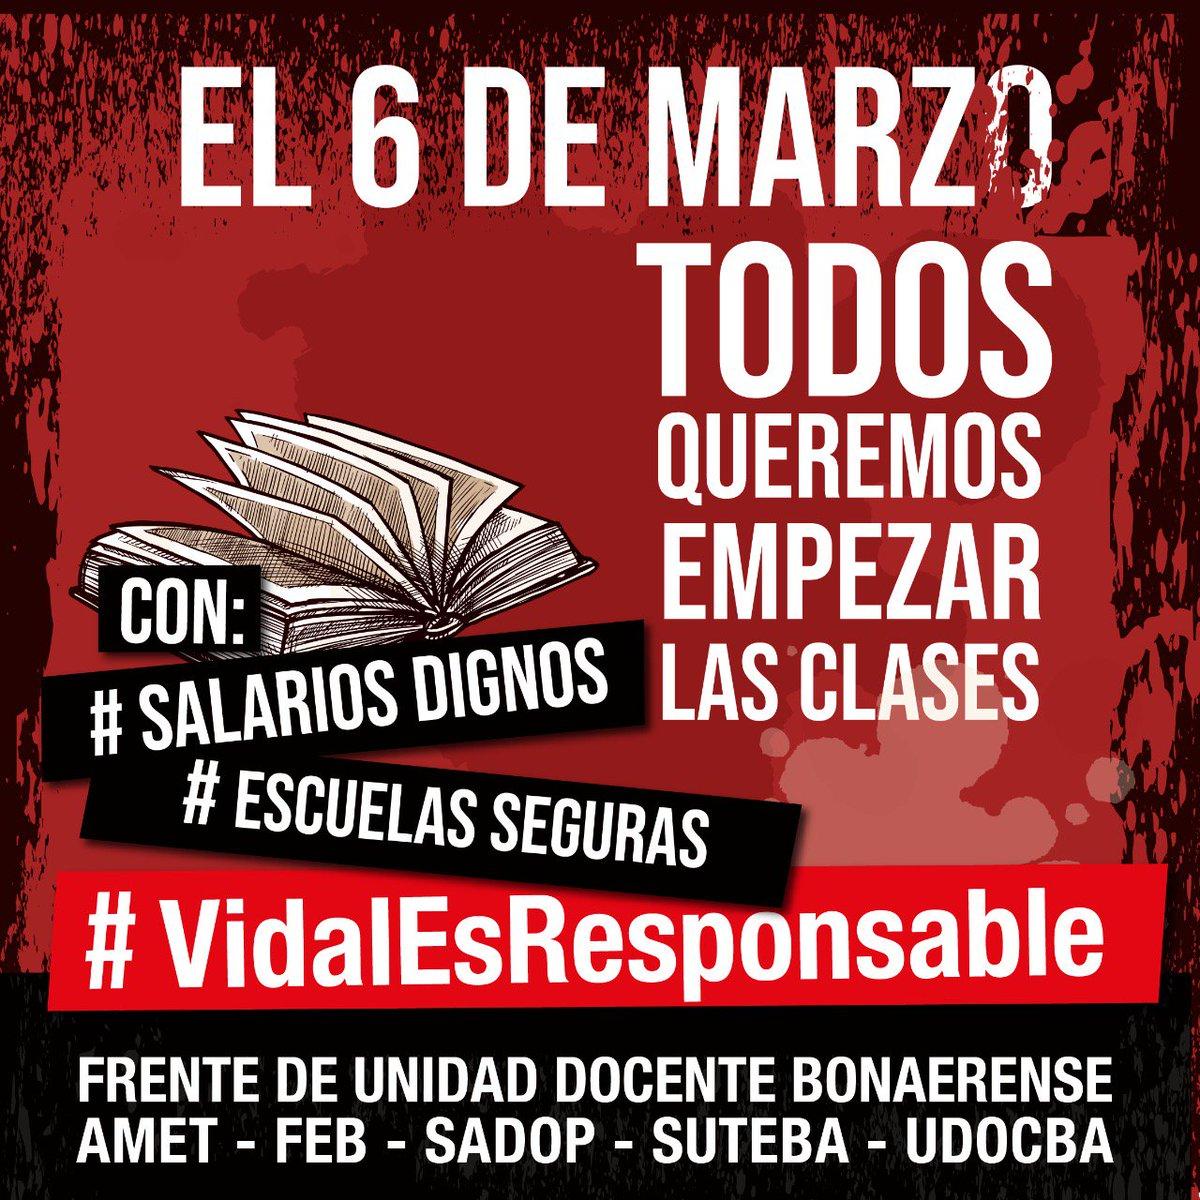 adriana monje's photo on #VidalEsResponsable